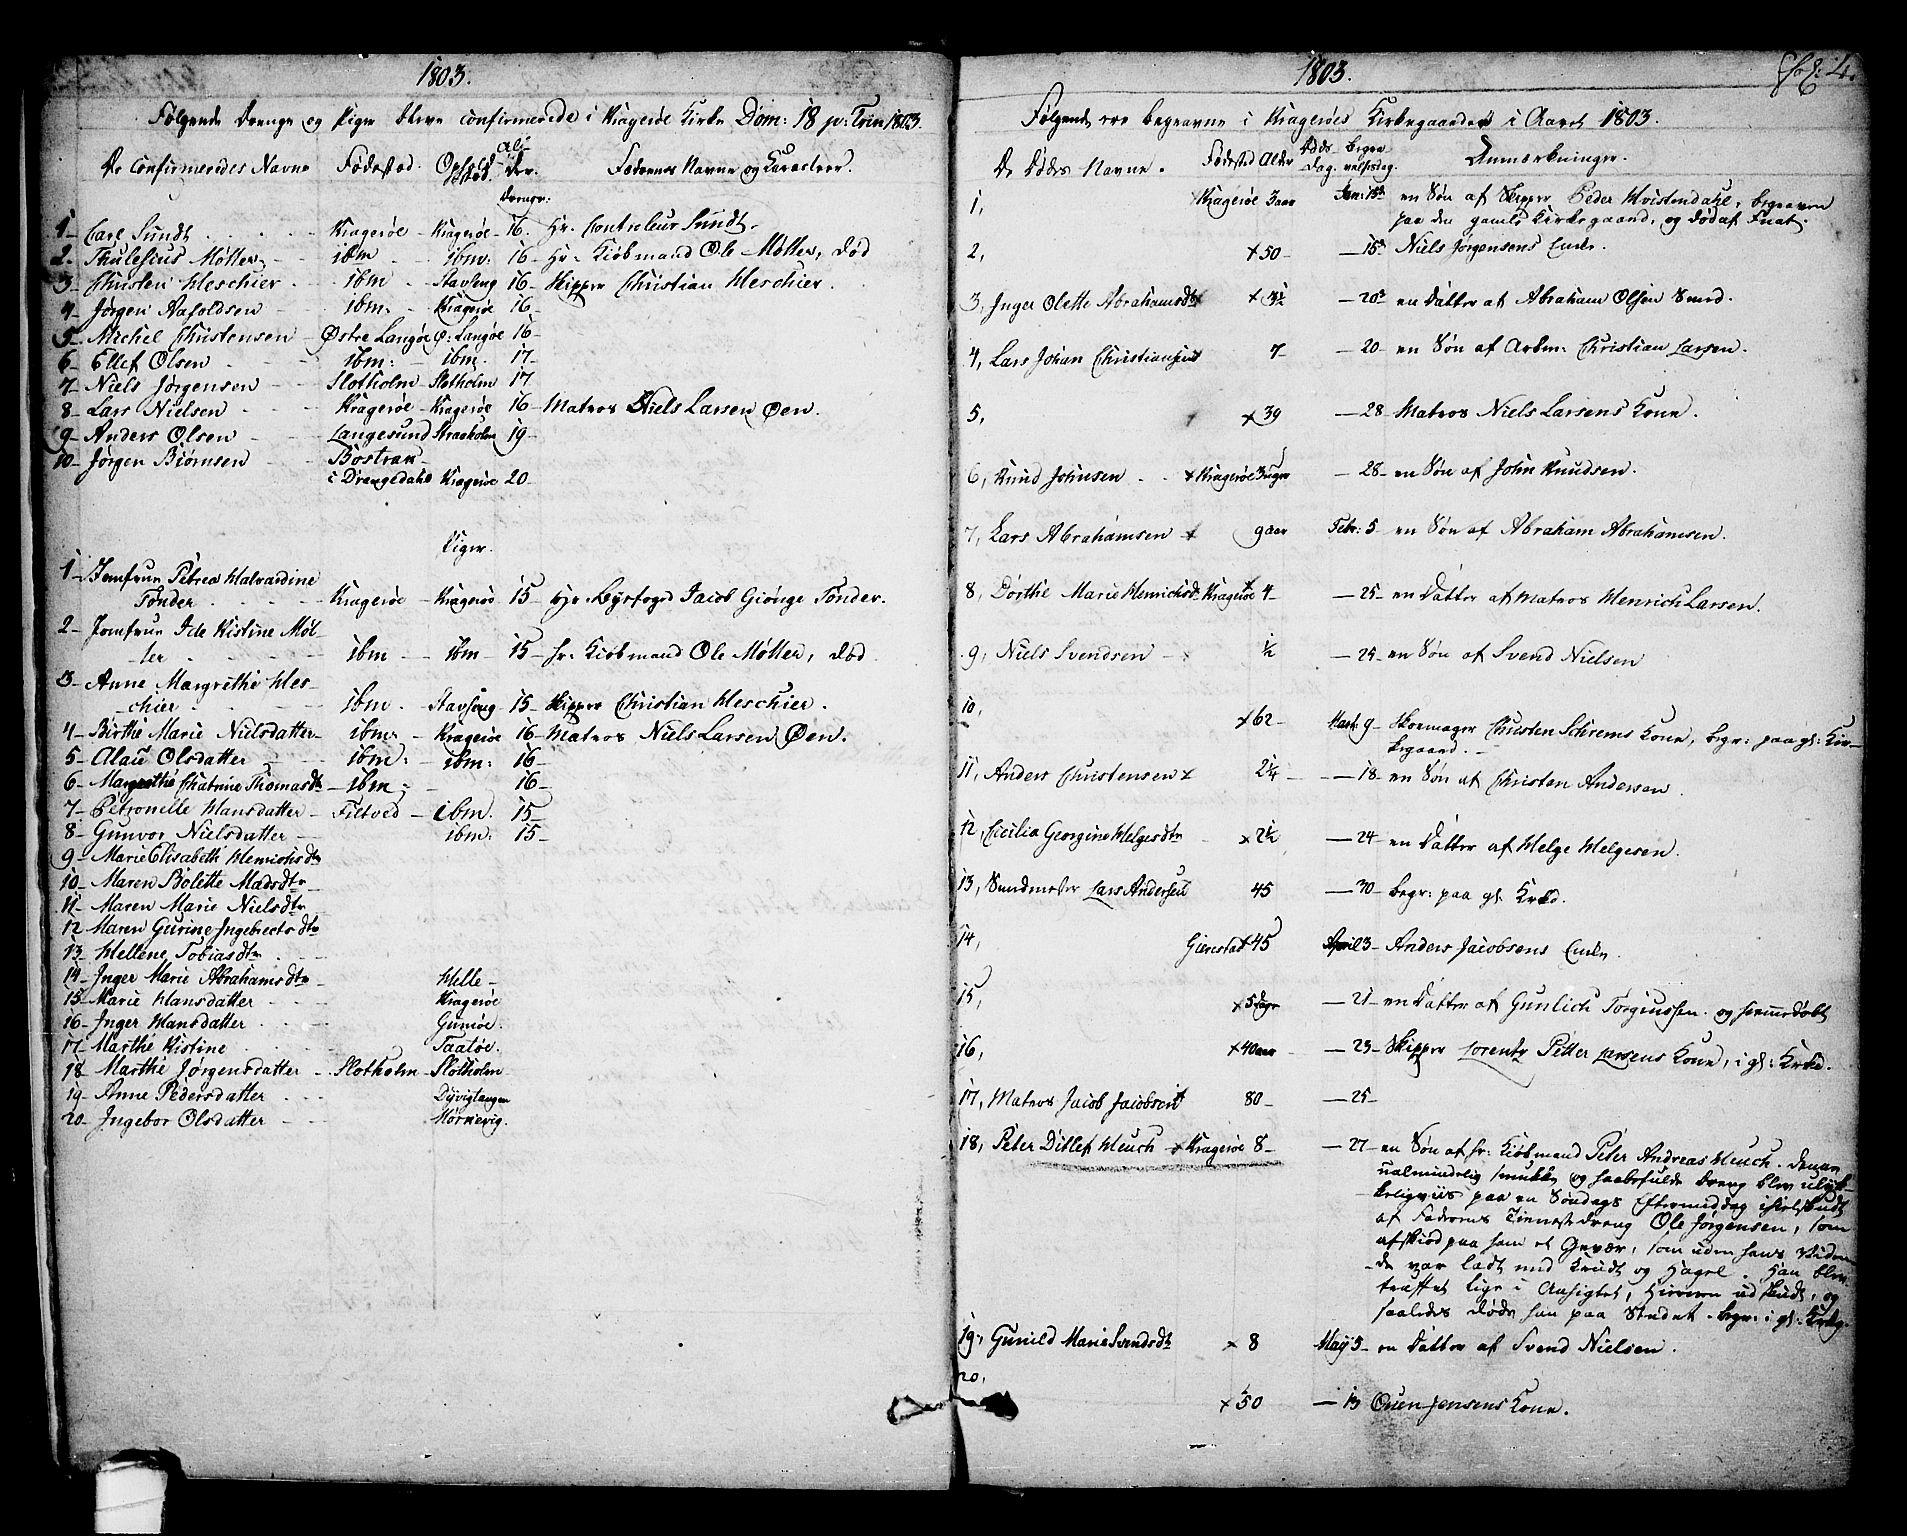 SAKO, Kragerø kirkebøker, F/Fa/L0003: Ministerialbok nr. 3, 1802-1813, s. 4